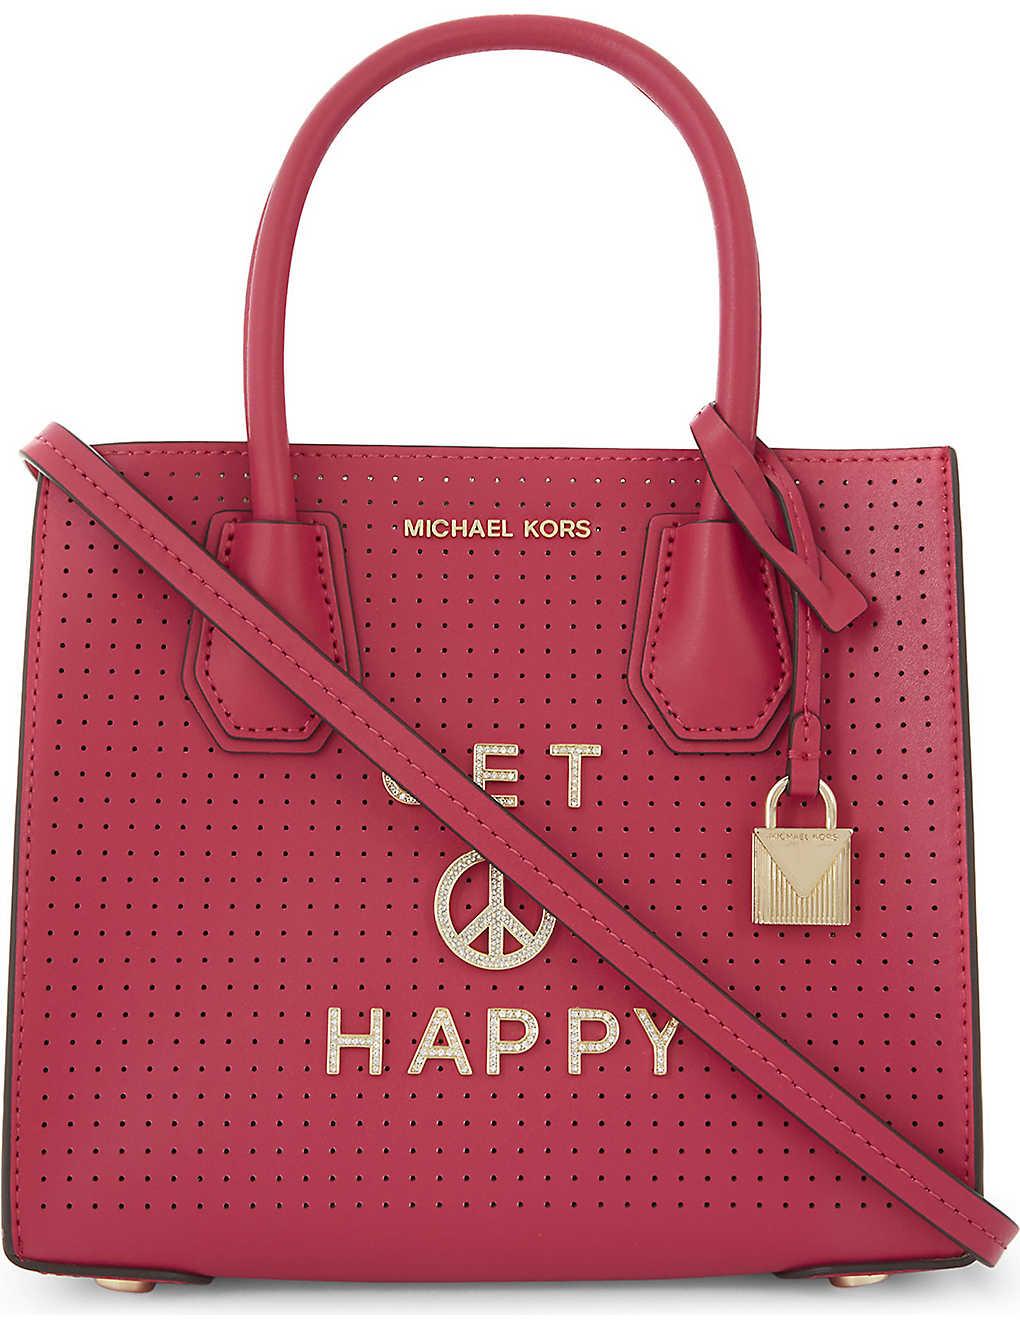 a0514748c1eb87 MICHAEL MICHAEL KORS - Mercer perforated leather cross-body bag ...